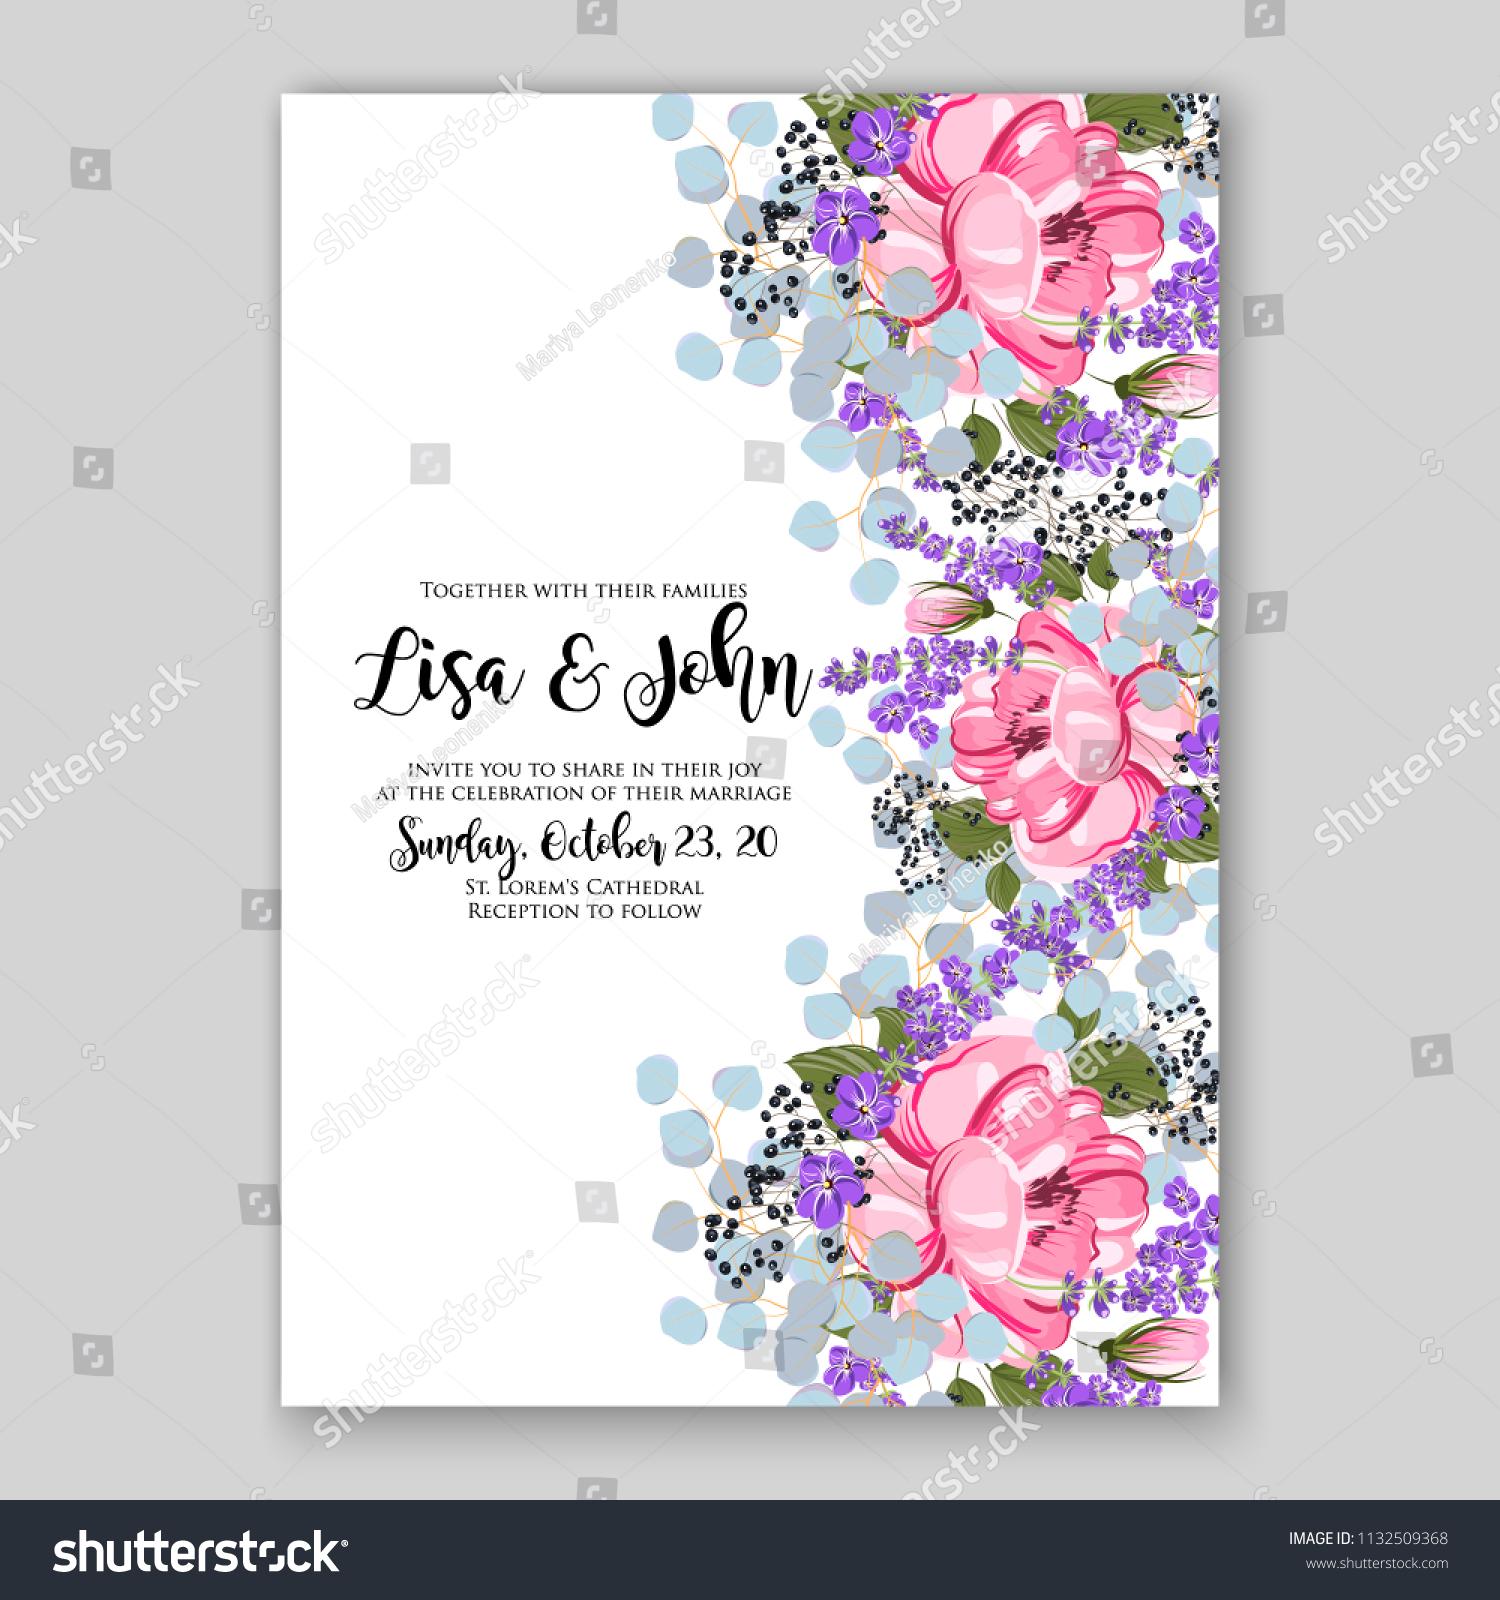 Wedding Invitation Card Flower Pink Peony Stock Vector (Royalty Free ...